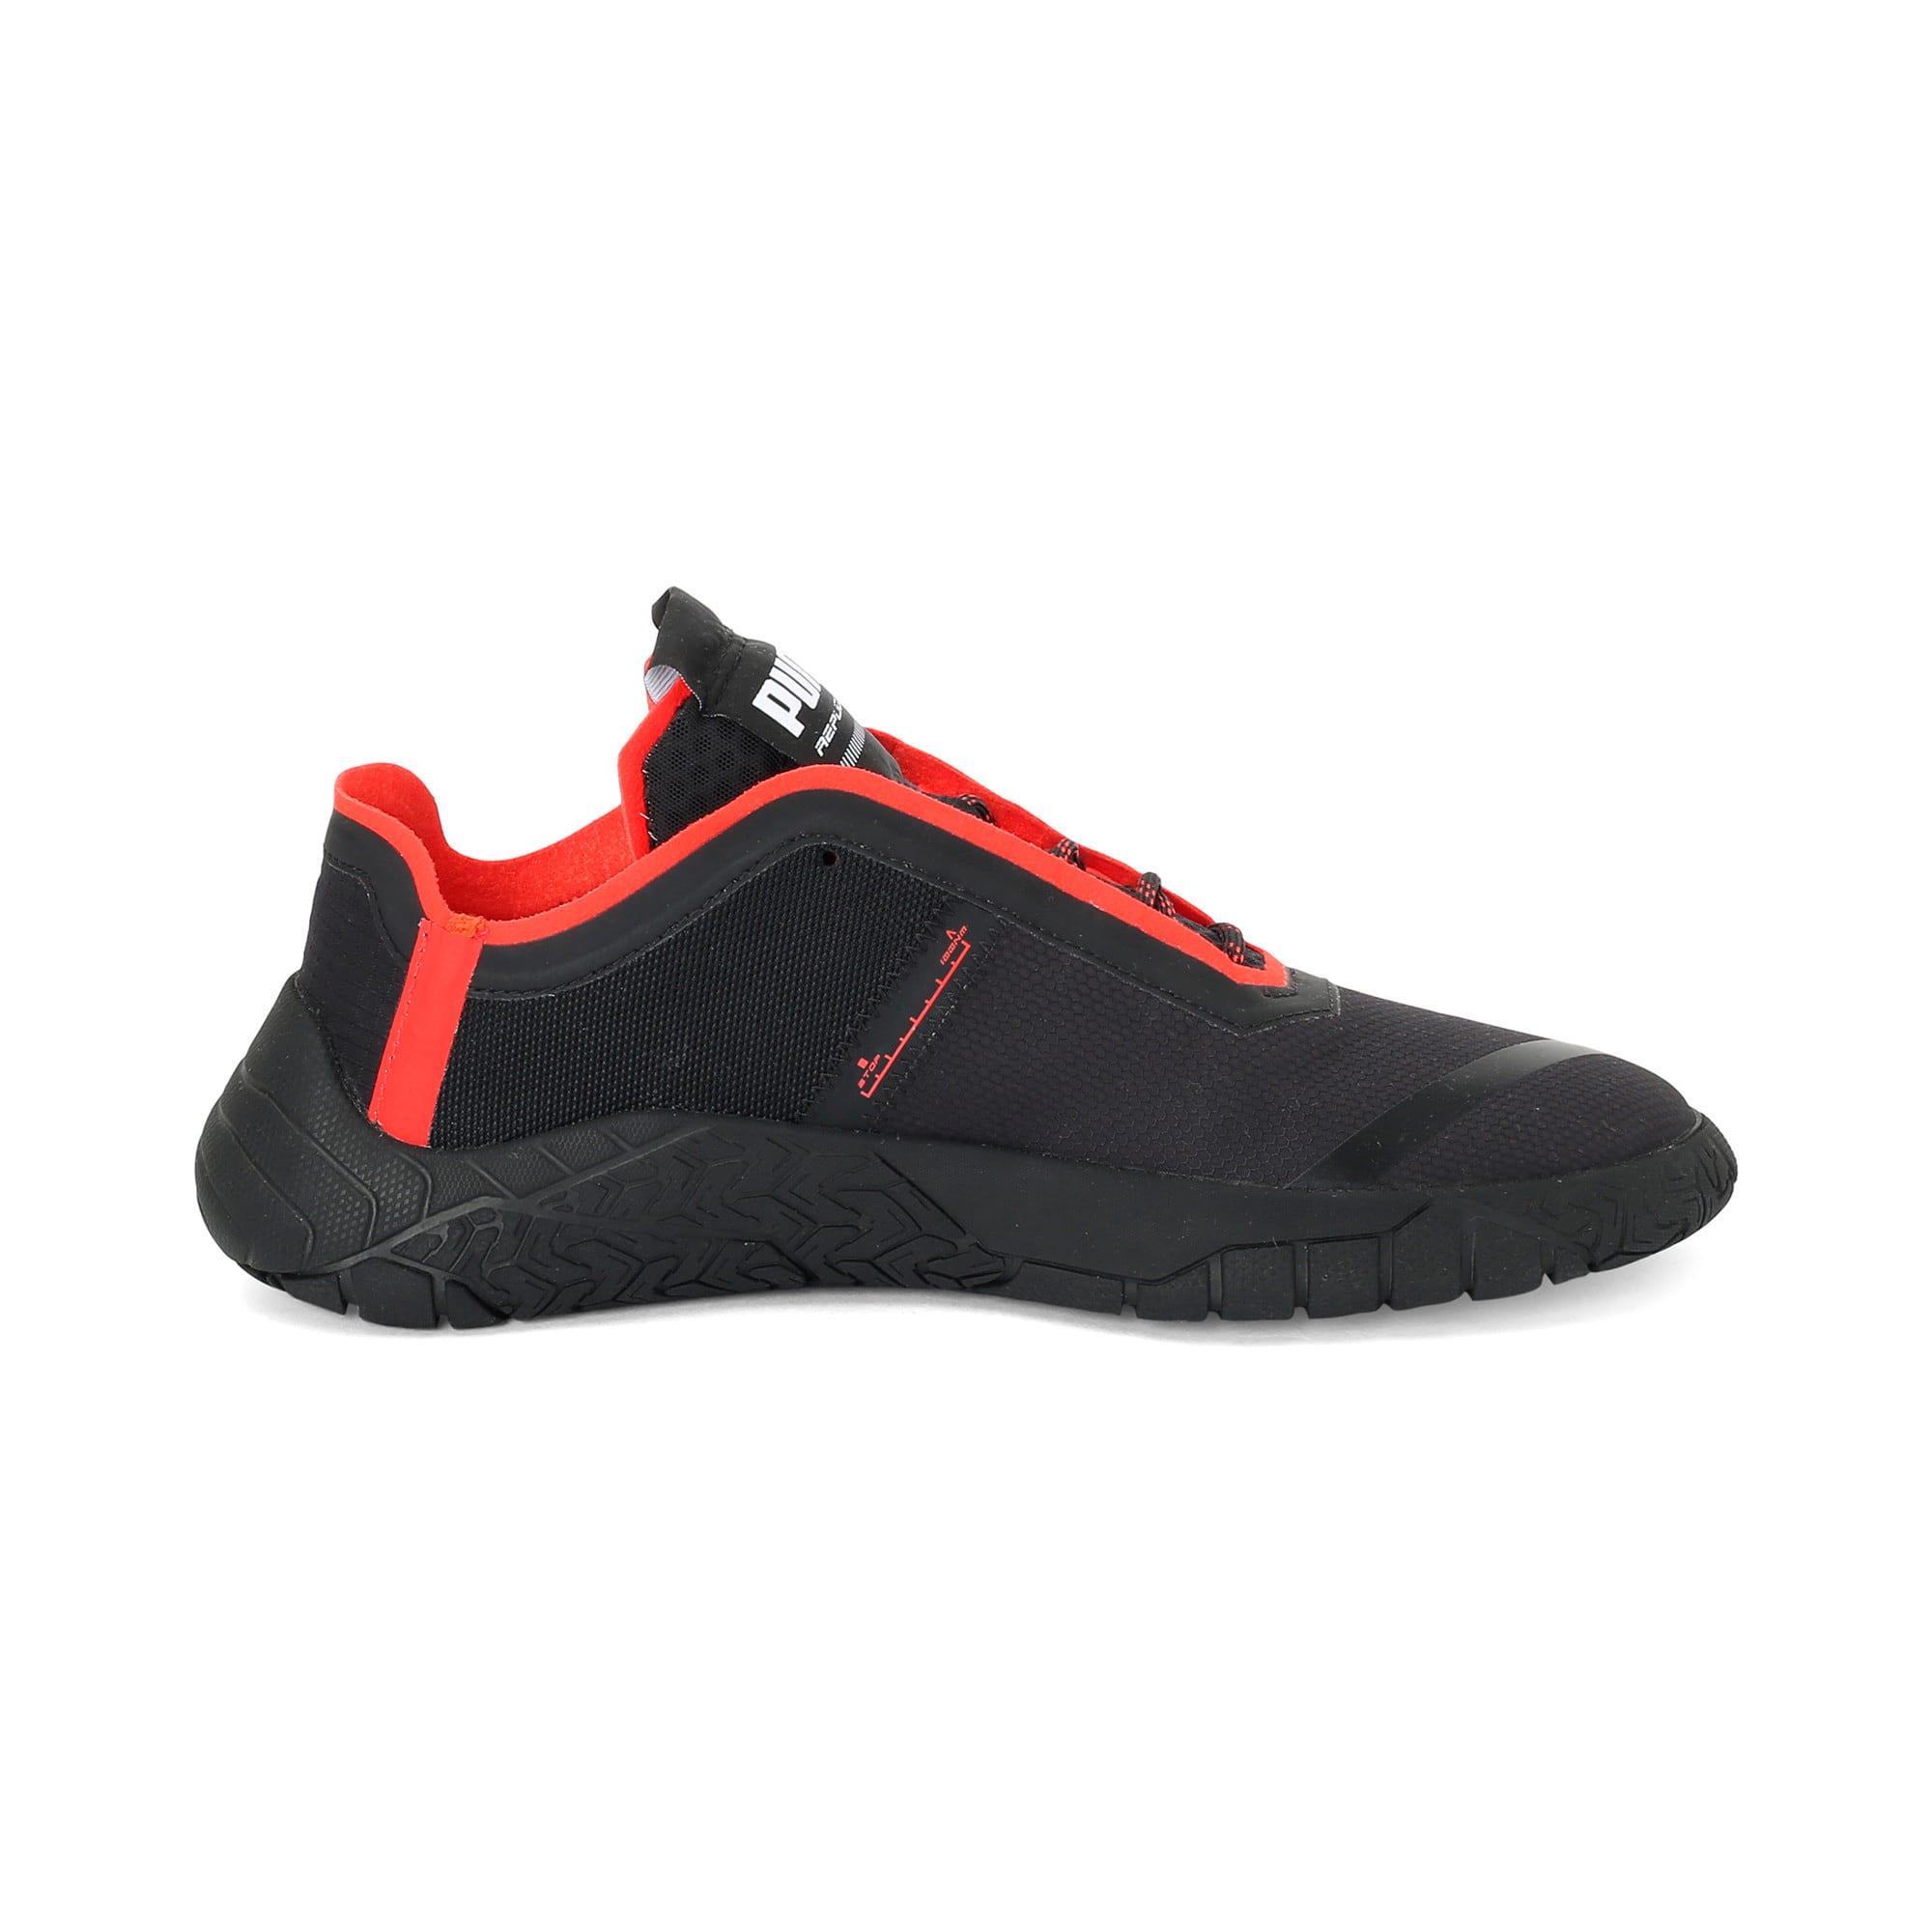 Thumbnail 4 of Replicat-X Circuit Trainers, Puma Black-Puma Red, medium-IND